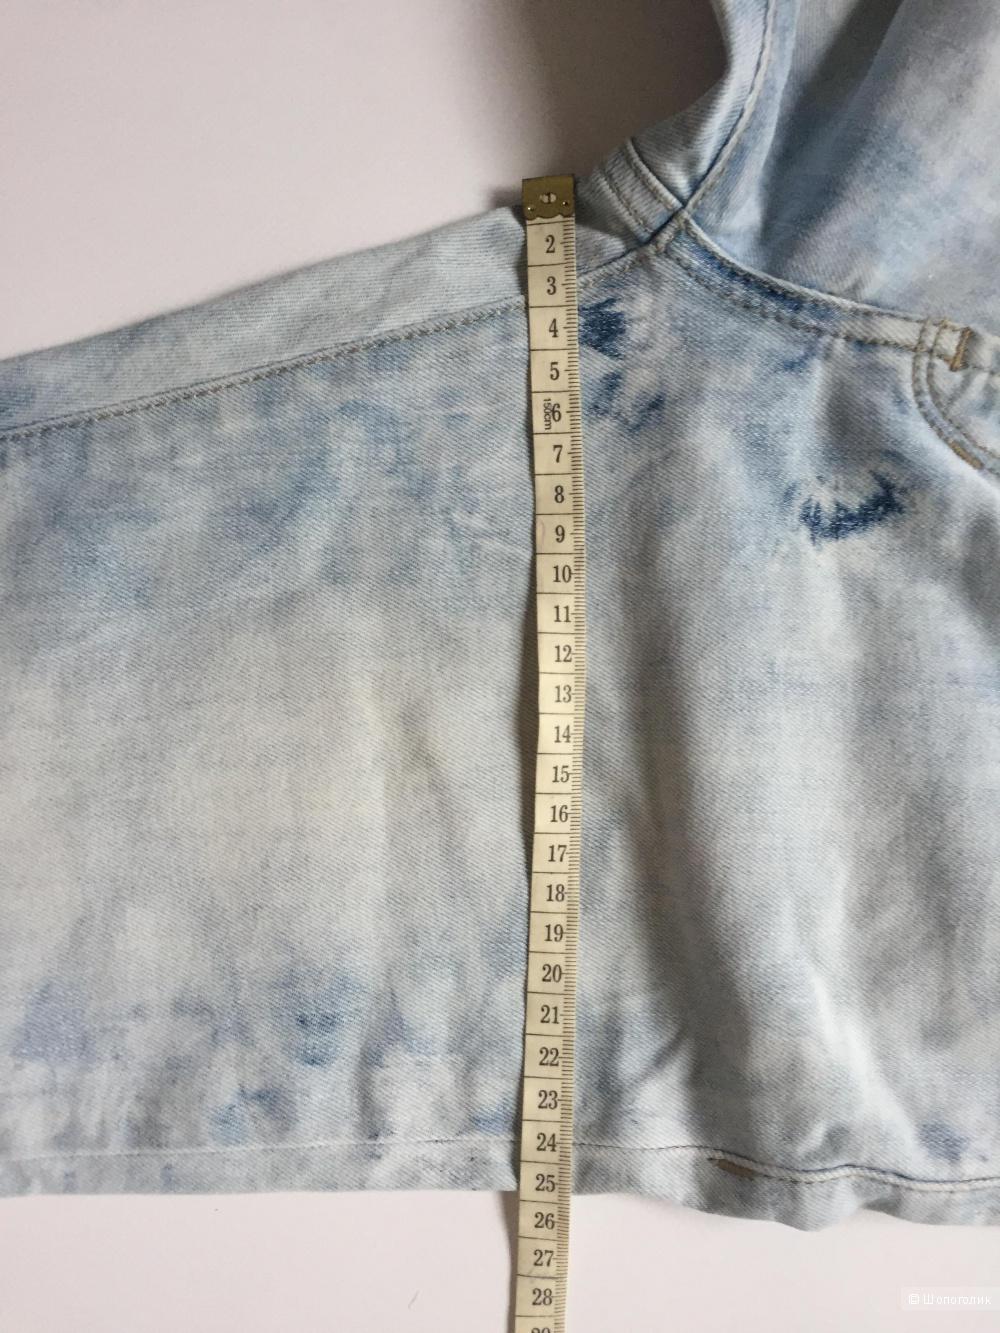 Сет джинсов no name и massimo dutti размер 44/46